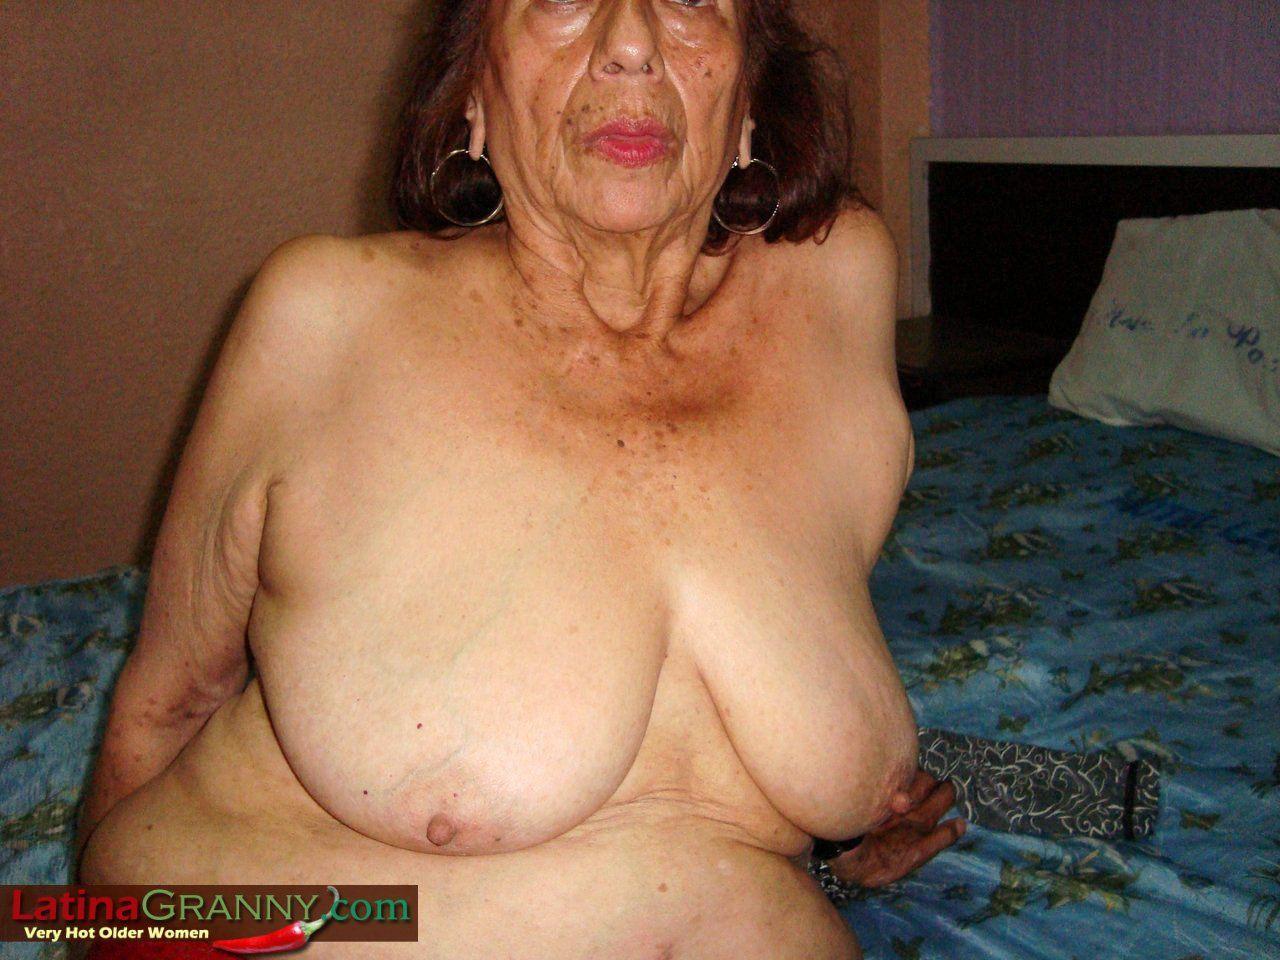 best of Latina porn Free granny